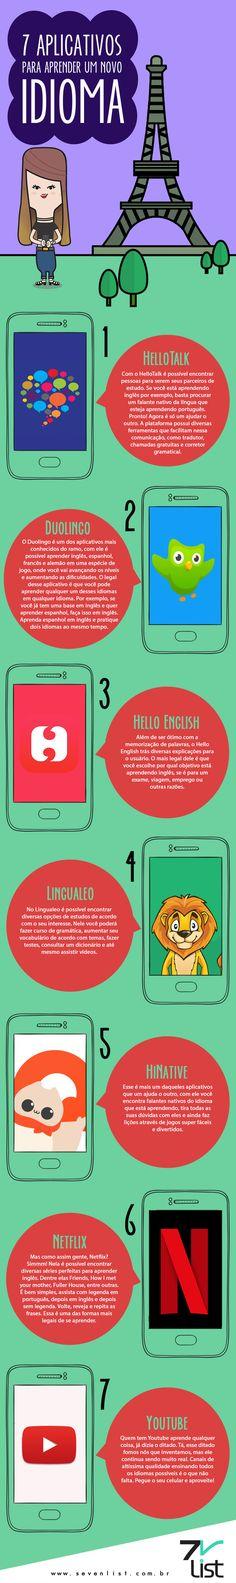 App para aprender inglês